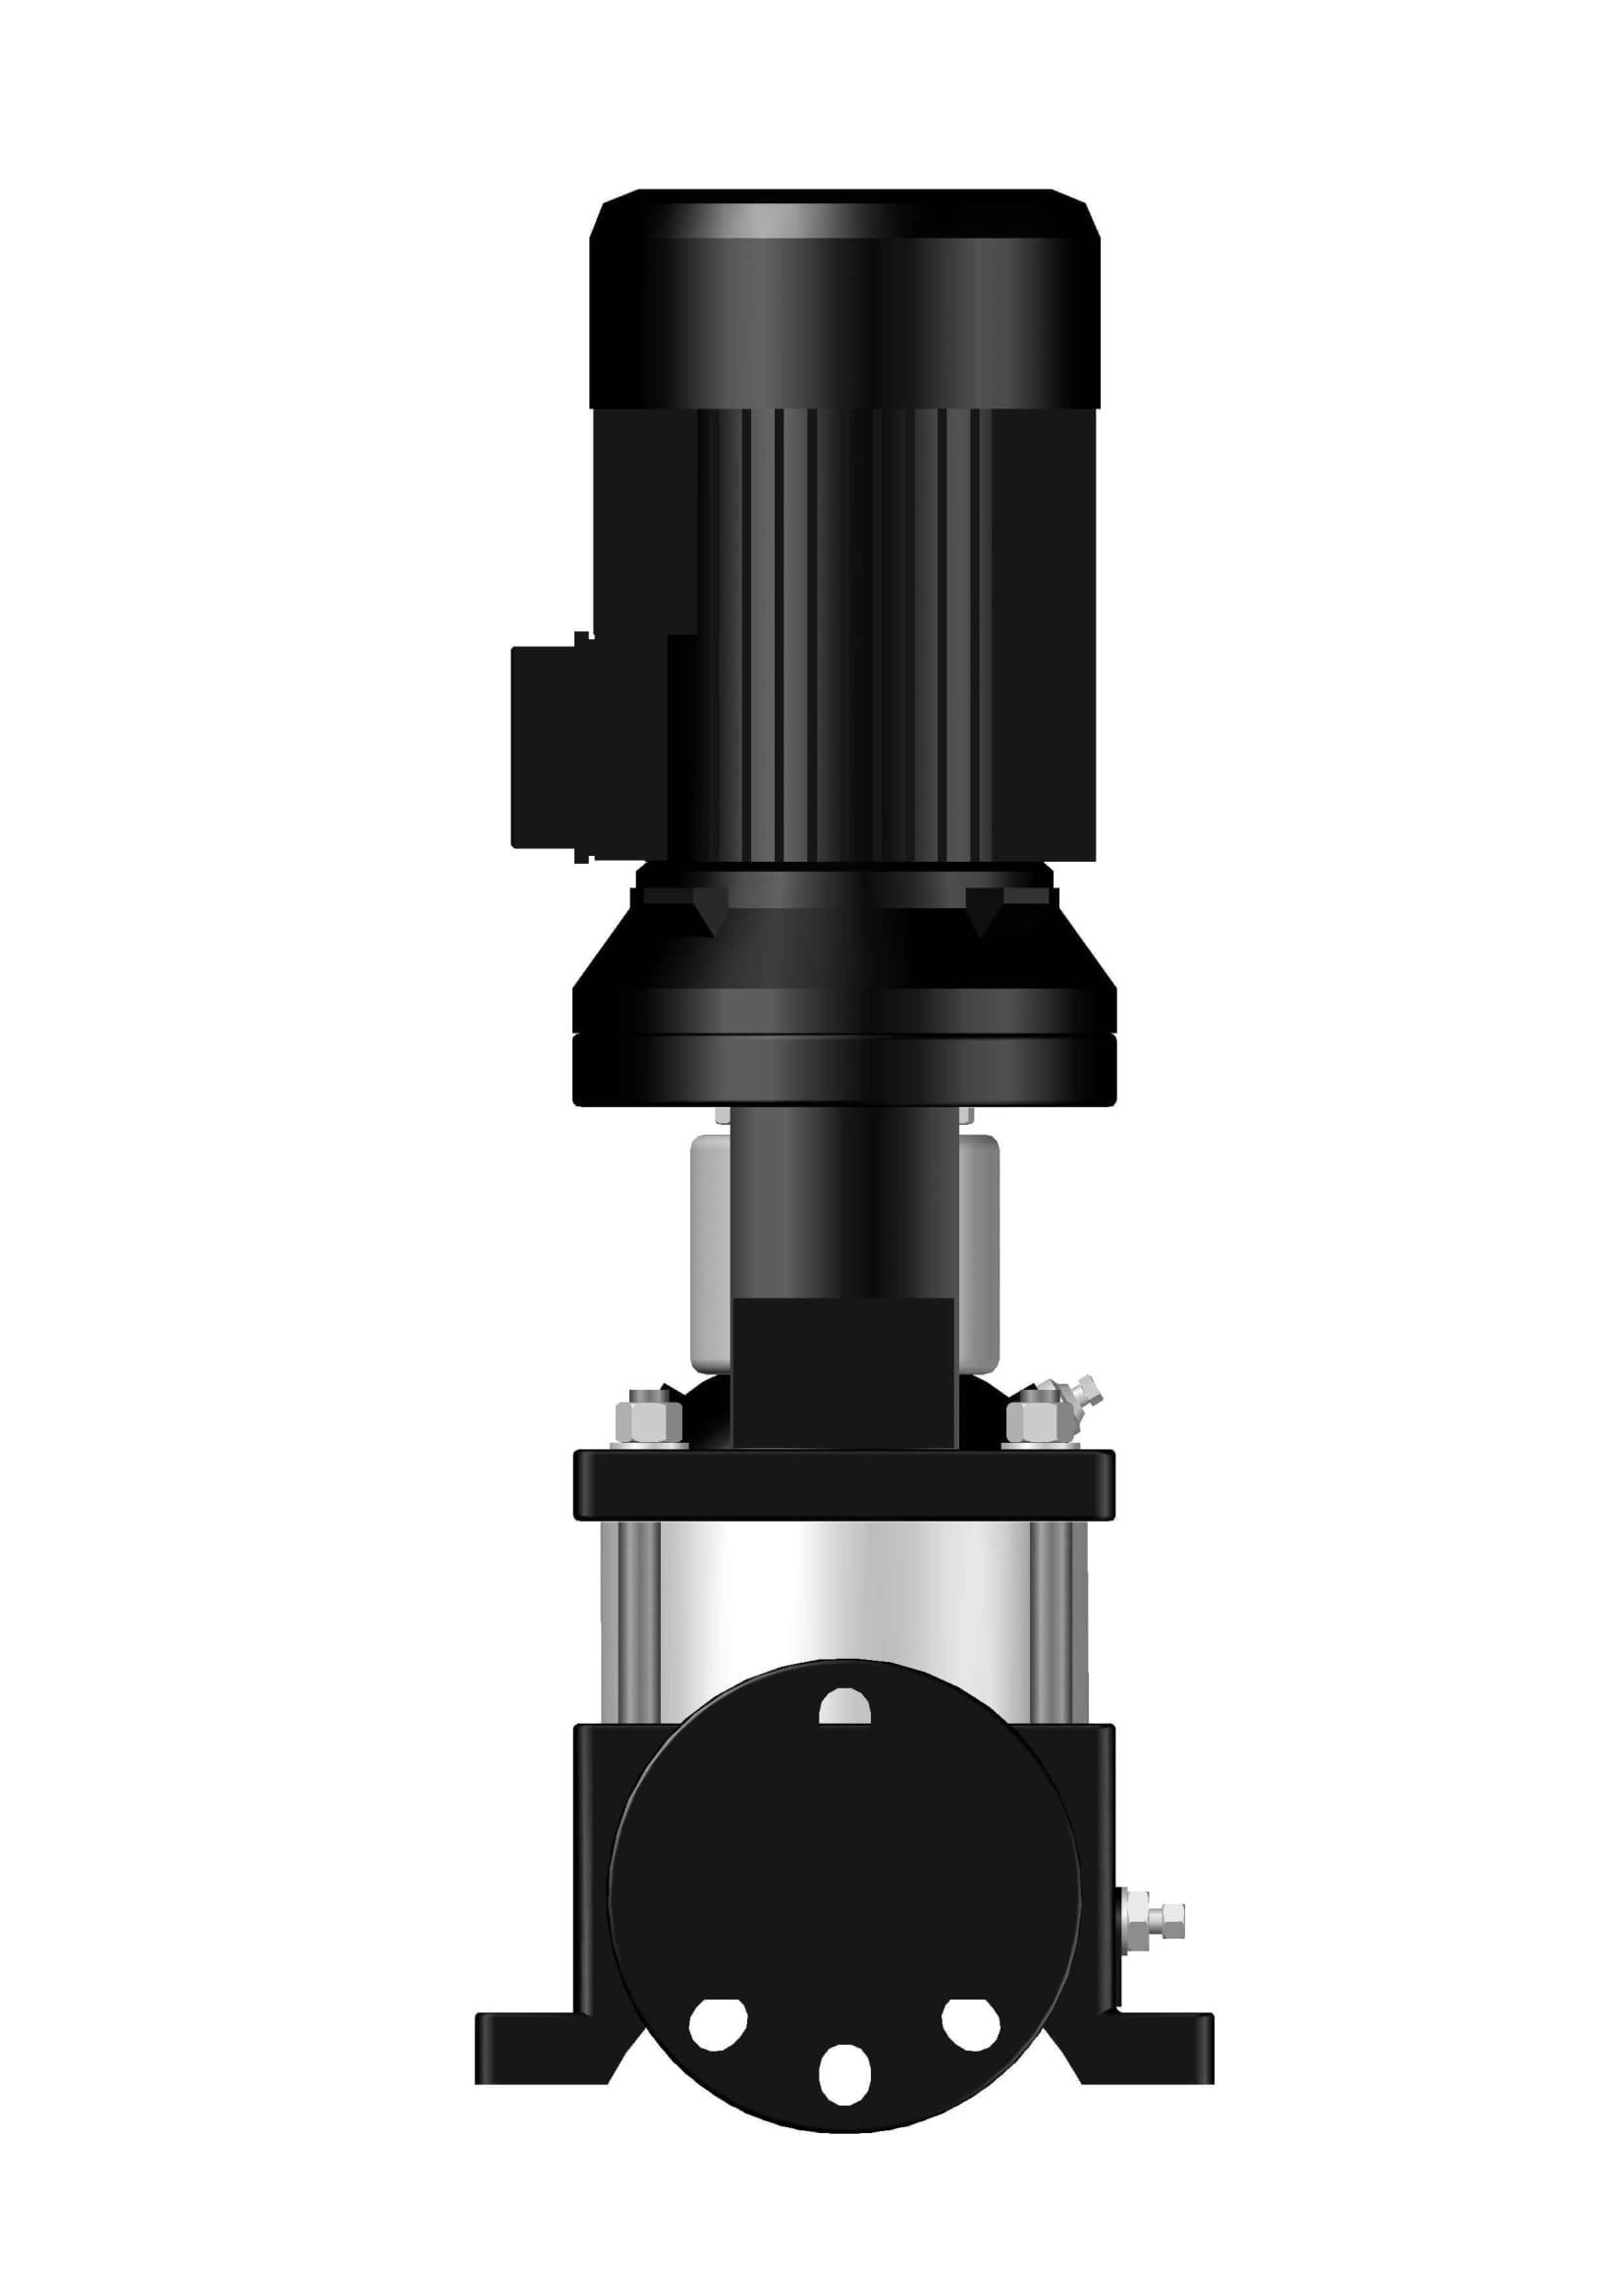 BV 15-02